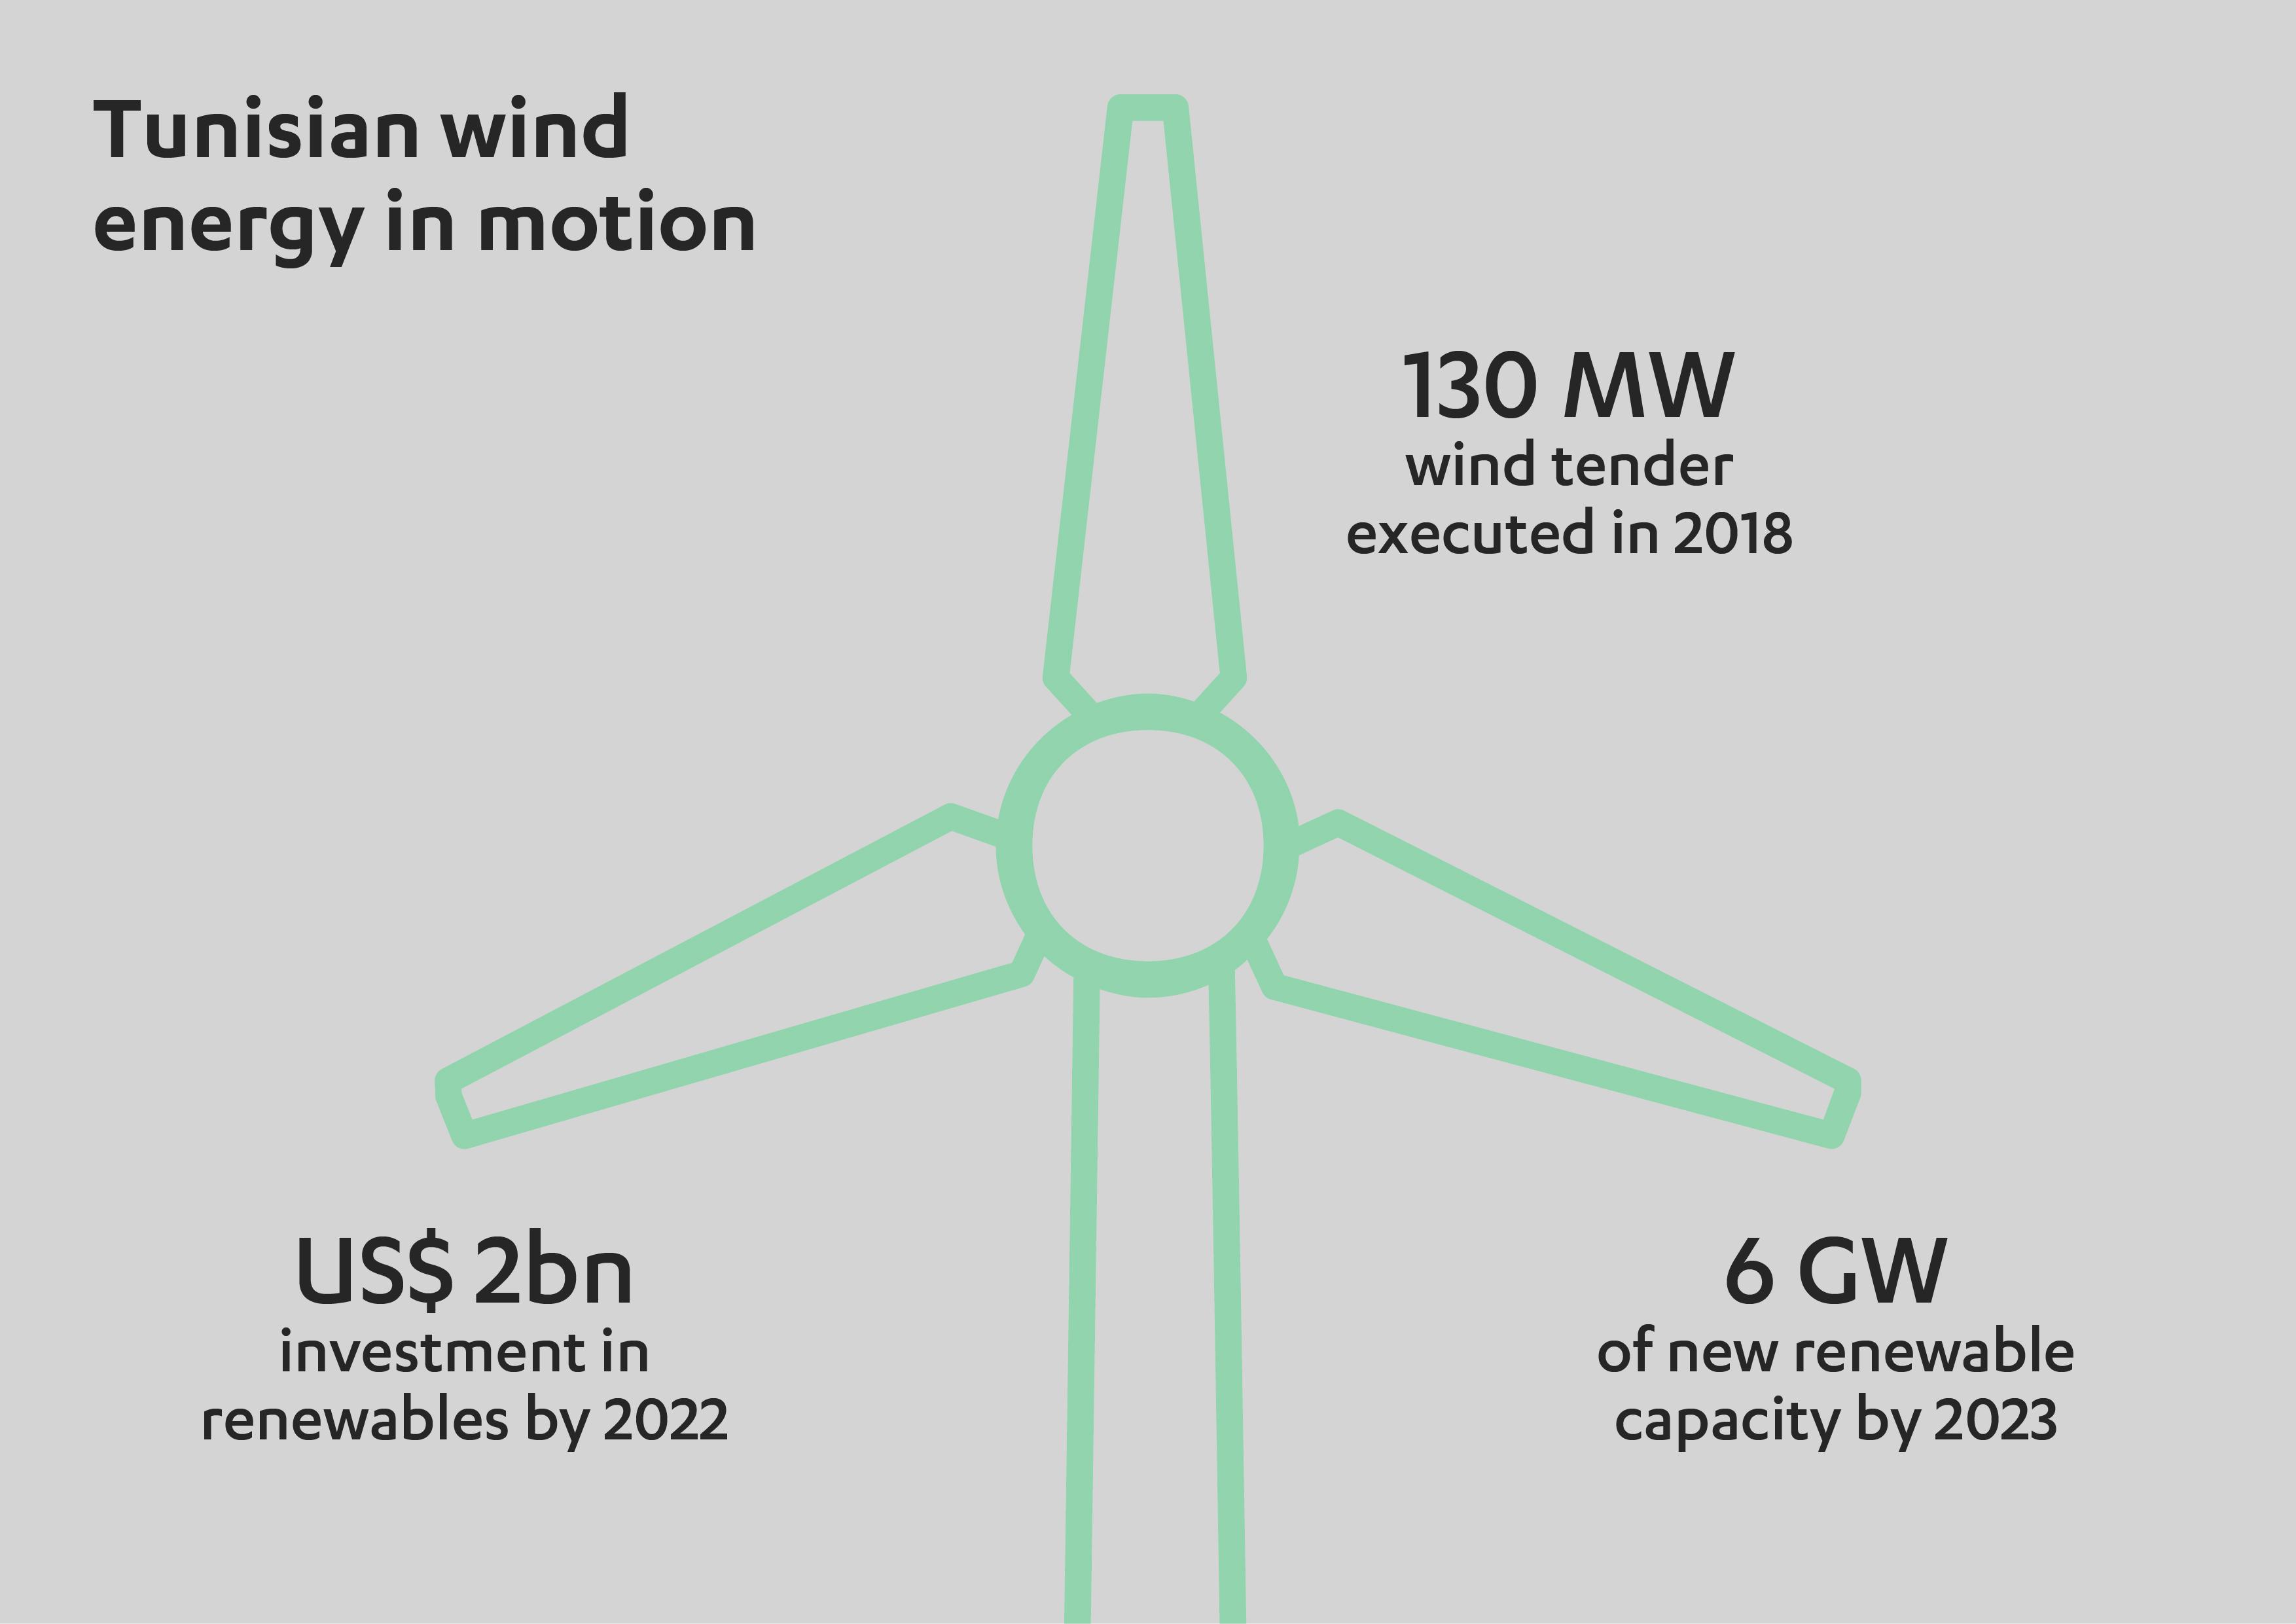 Tunisia: new opportunities for wind energy investors - Abdul Latif